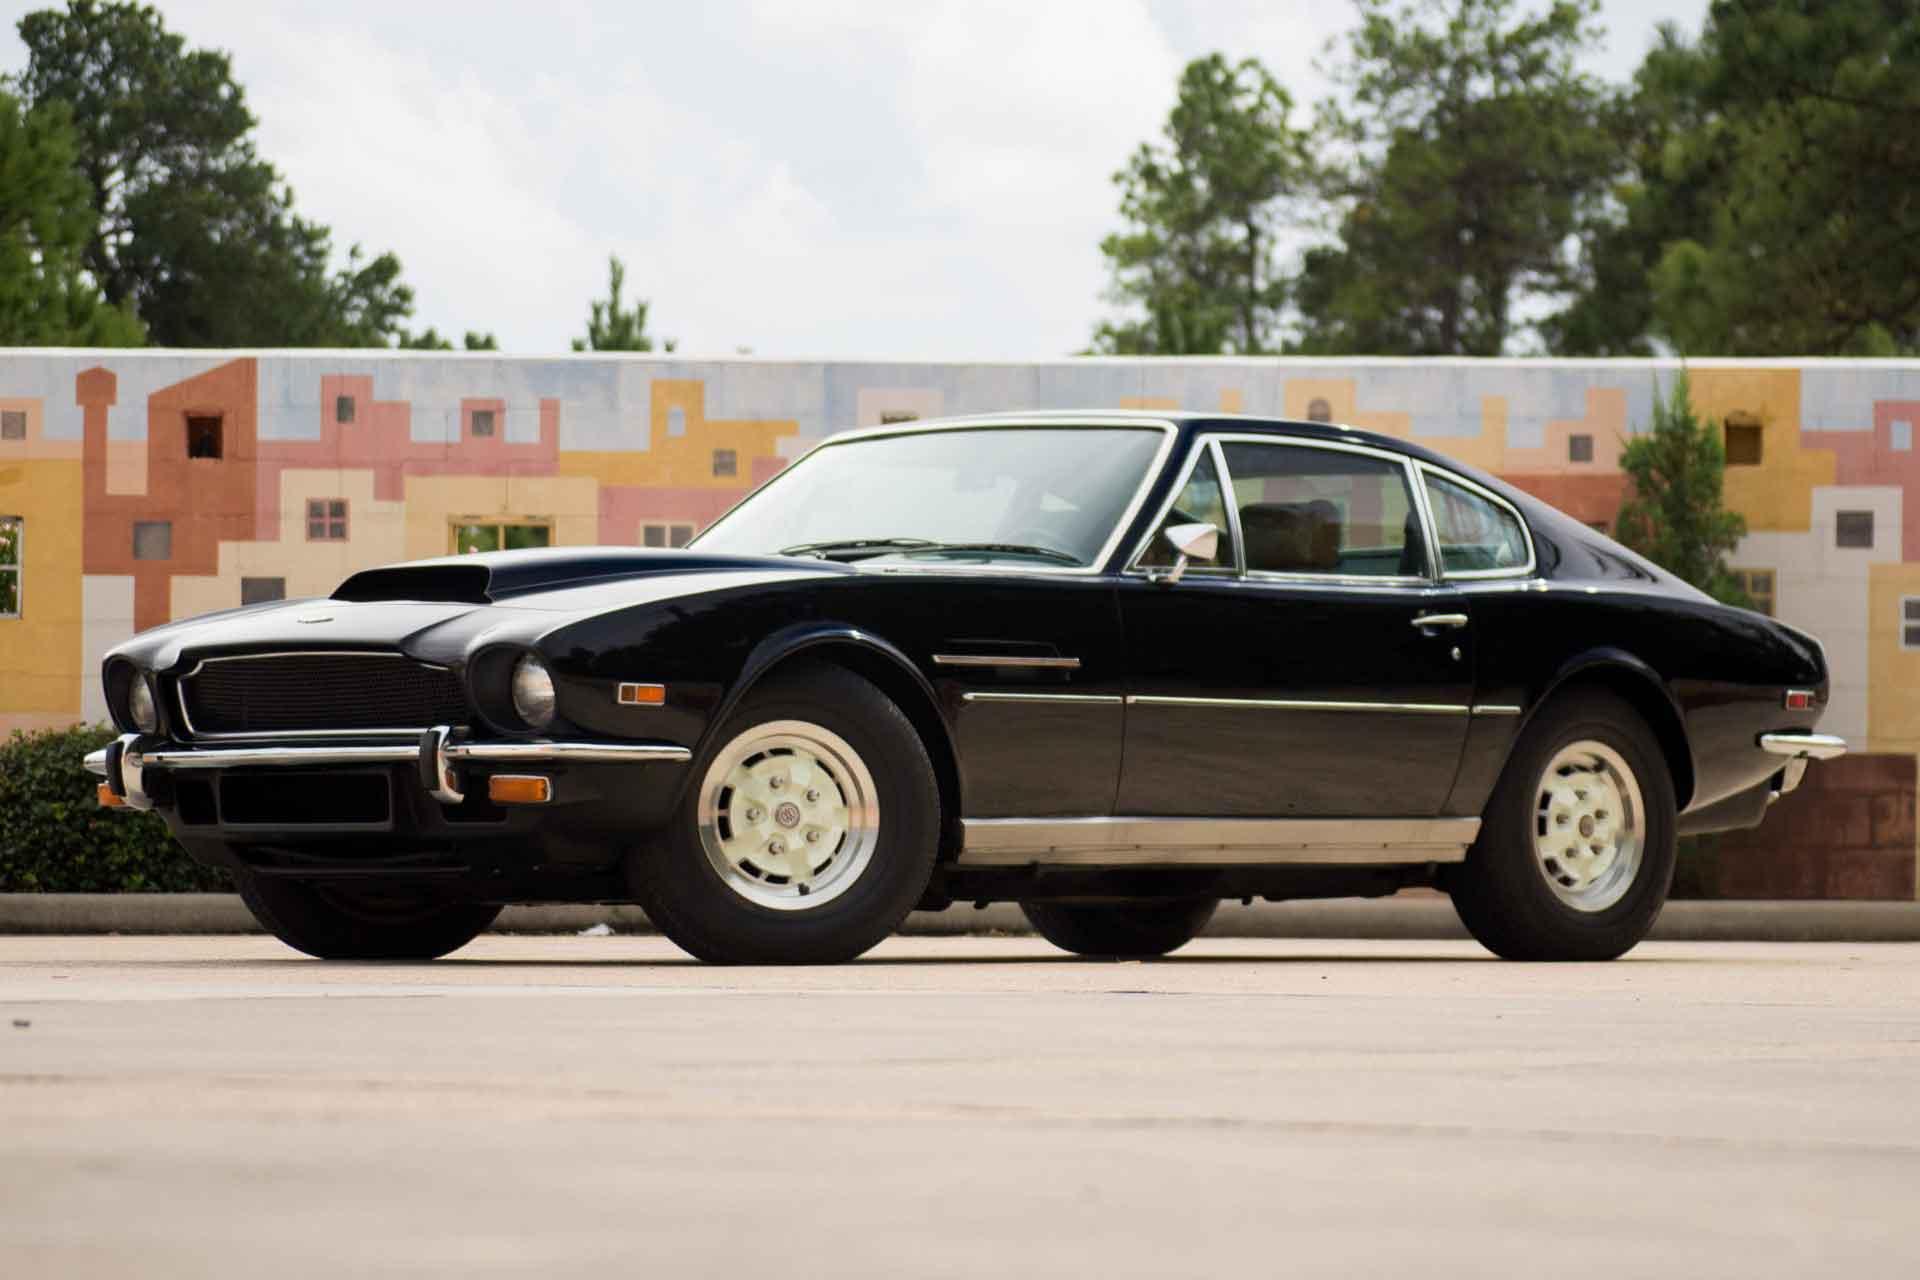 1978 Aston Martin V8 Series III Coupe